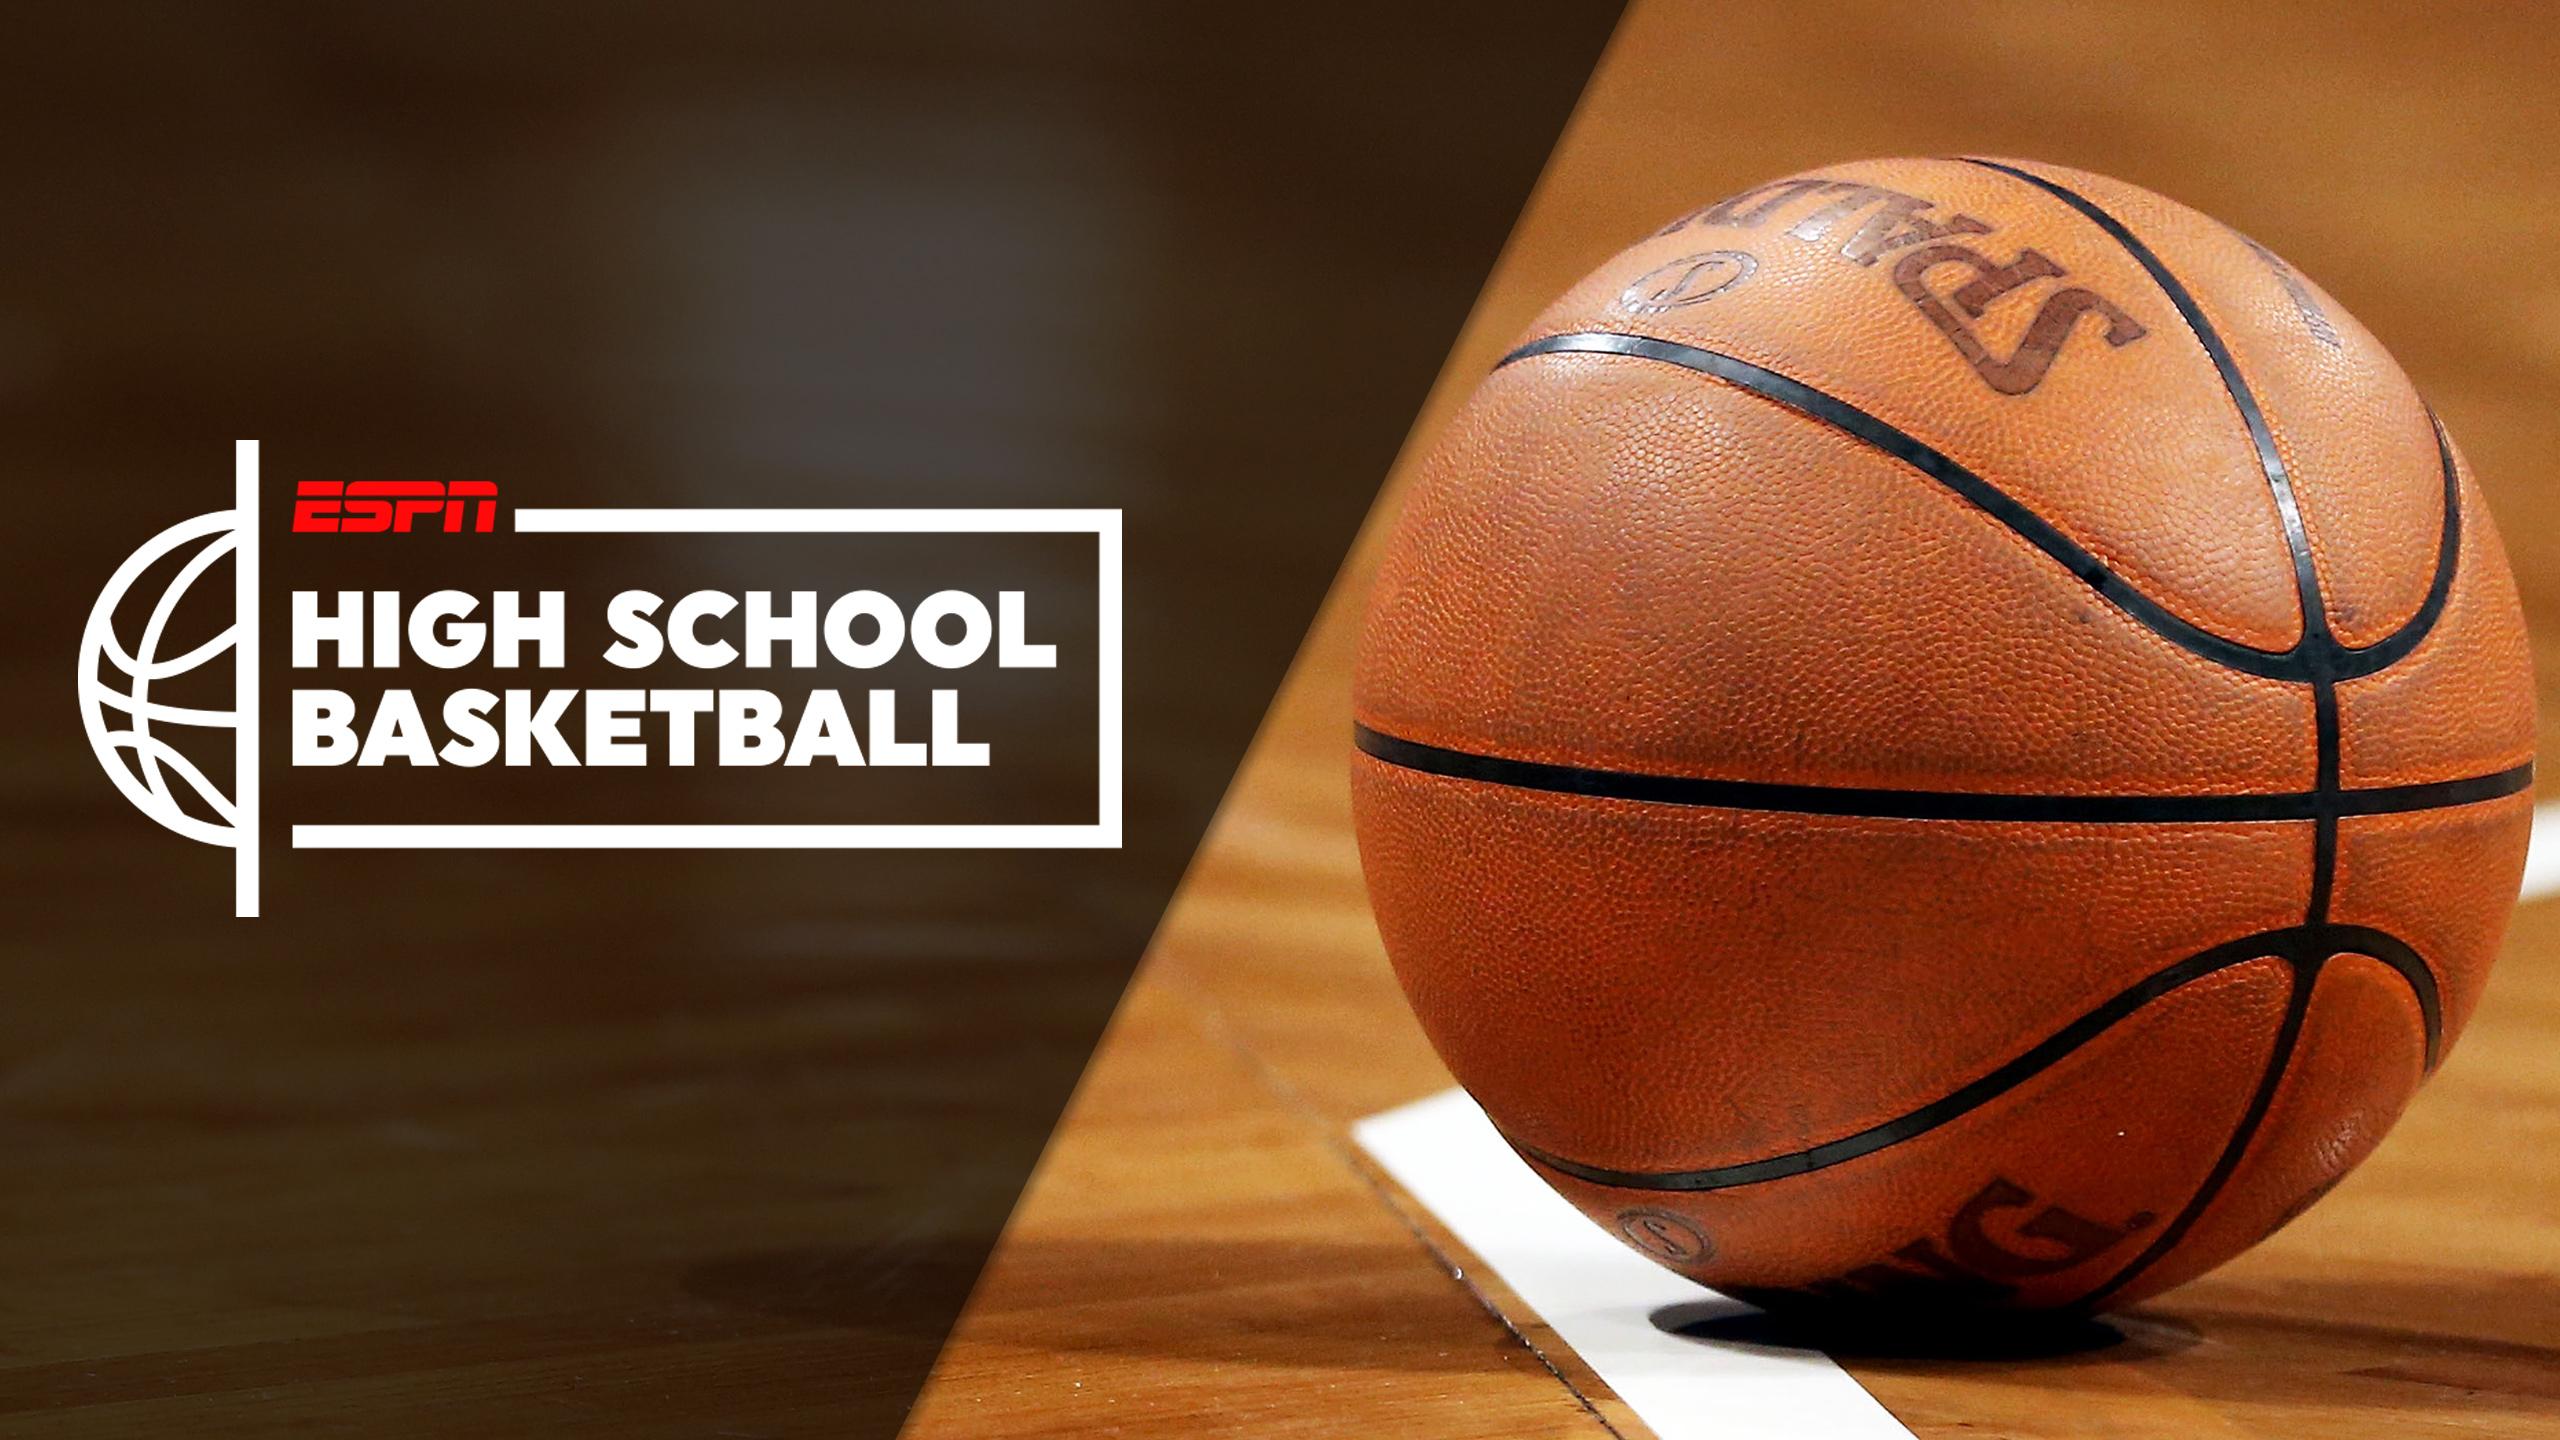 High School Basketball Studio